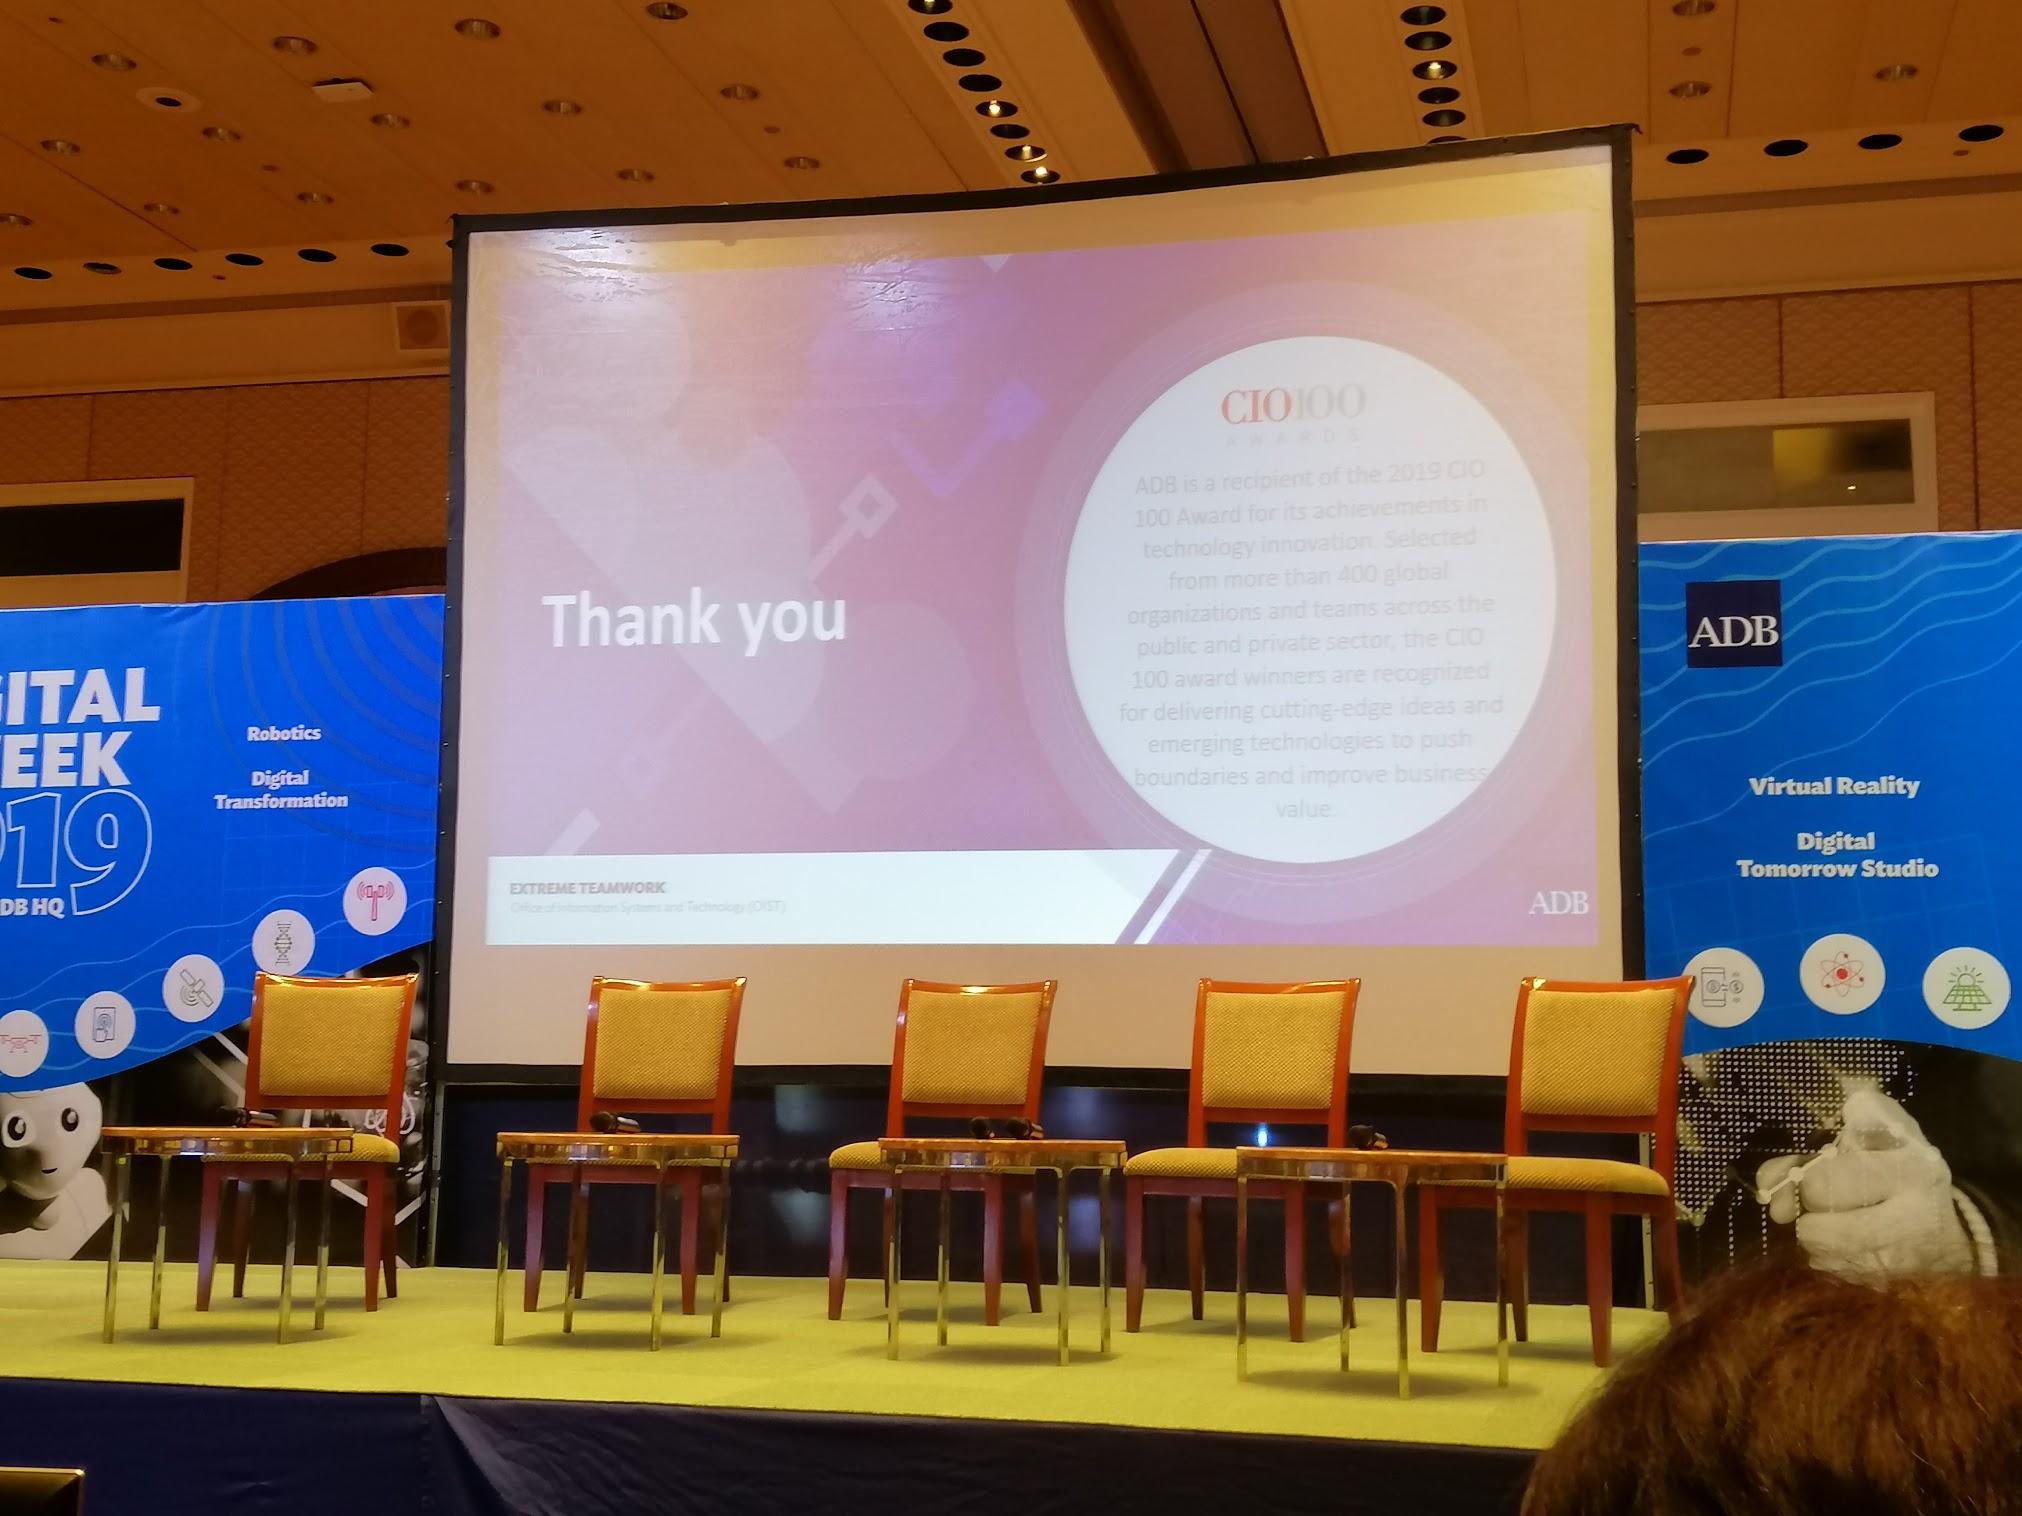 9:50 a.m. - OIST PD Shirin Hamid gives an overview of ADB's Digital Agenda 2030